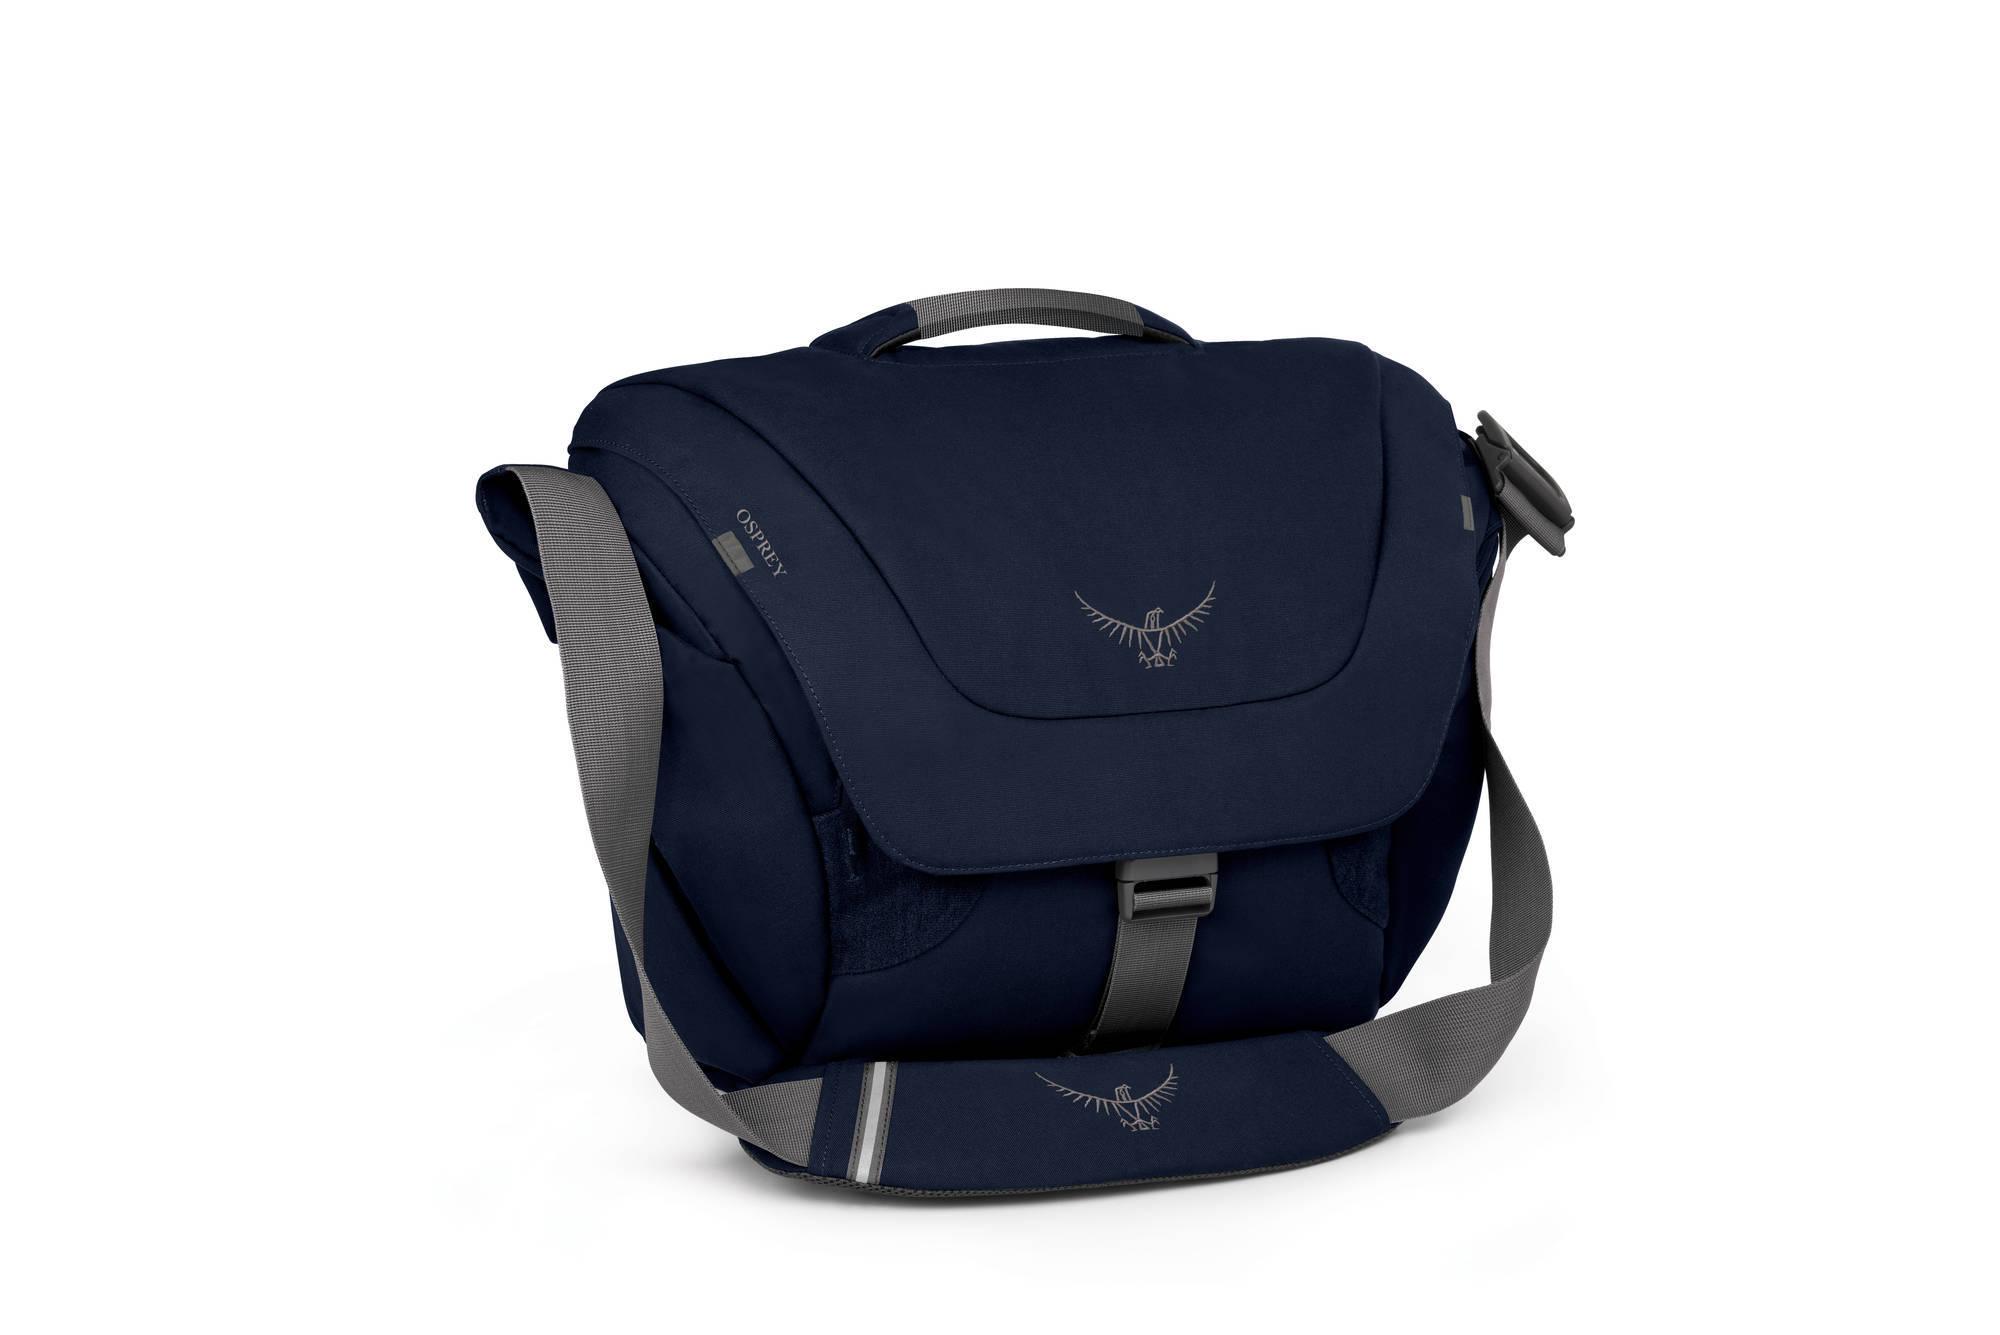 Аксессуары Сумка Osprey Flap Jack Courier Flap_Jack_Courier_Side_Twilight_Blue_web.jpg